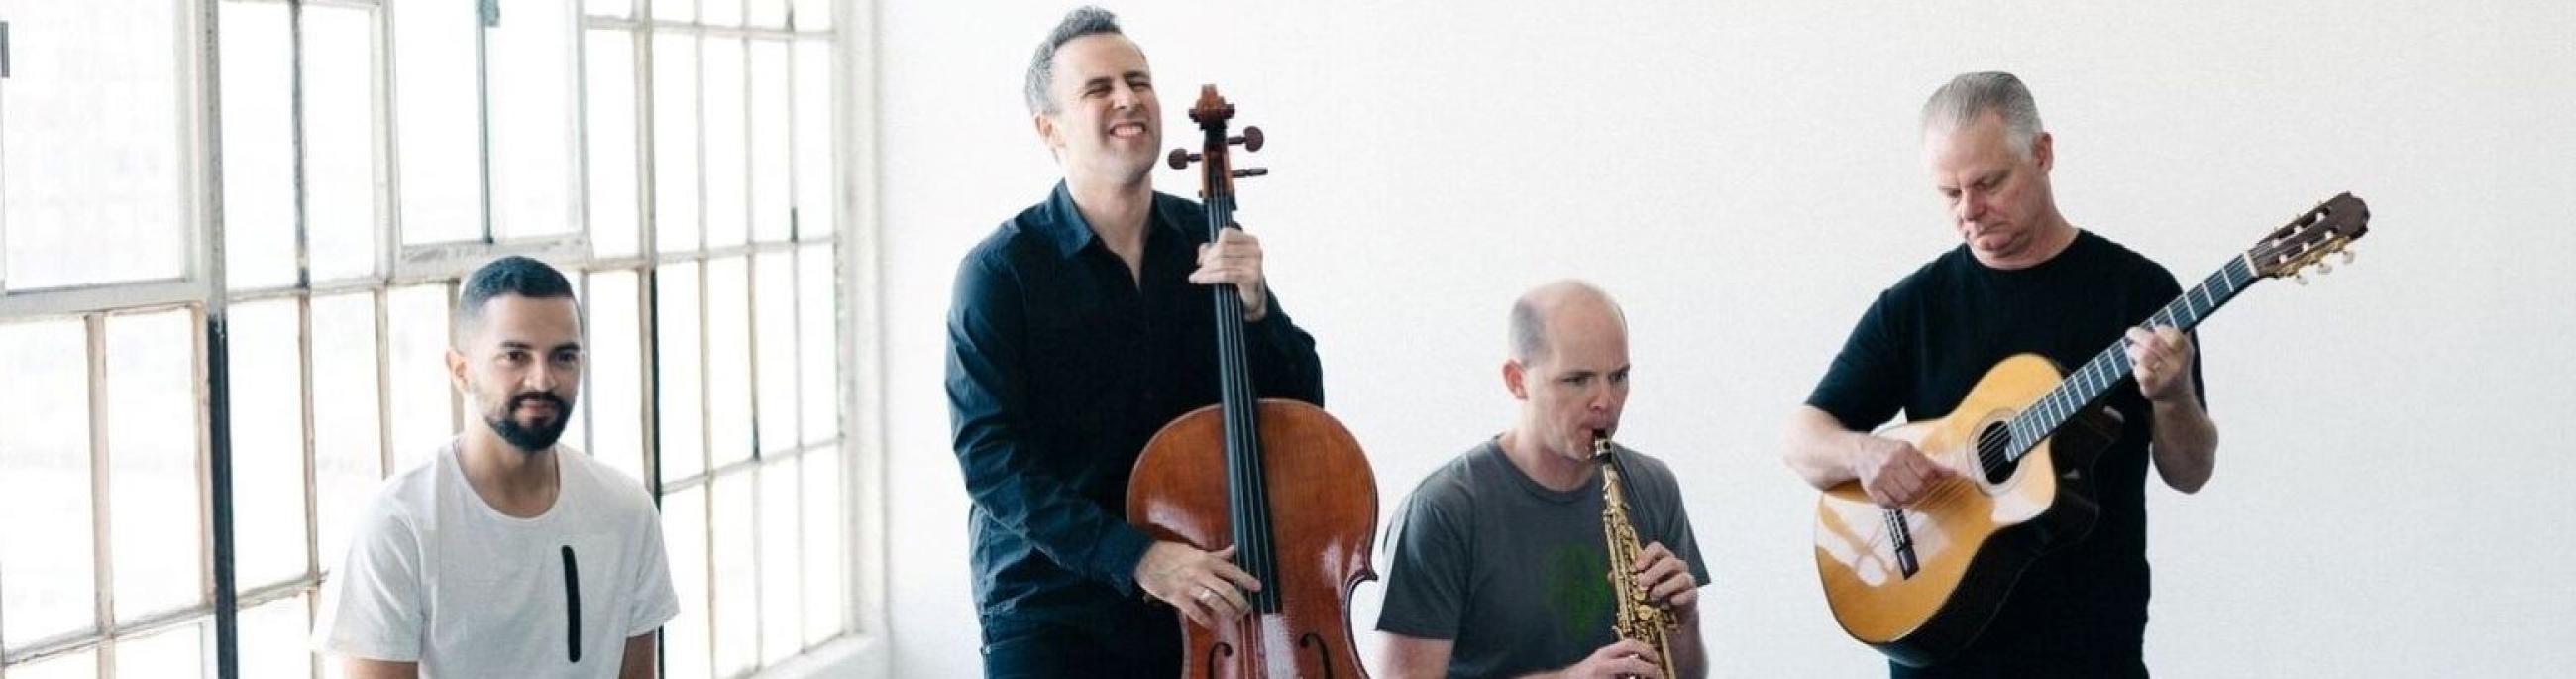 Four members of Quarteto Nuevo perform in a bright, airy industrial loft.